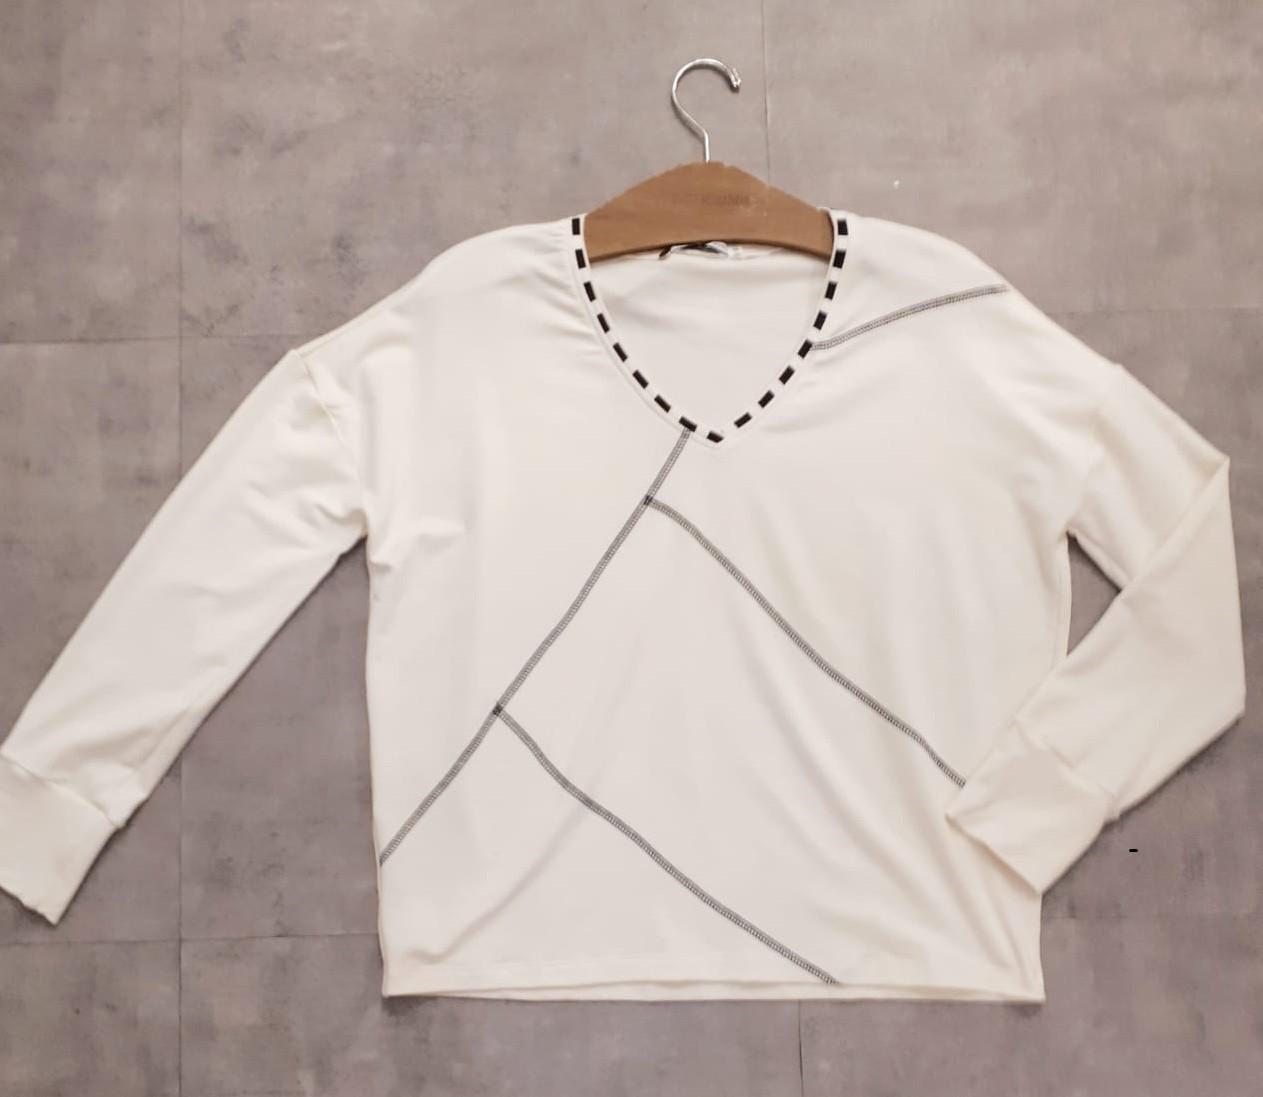 Blusa moletinho manga longa costura desenhada